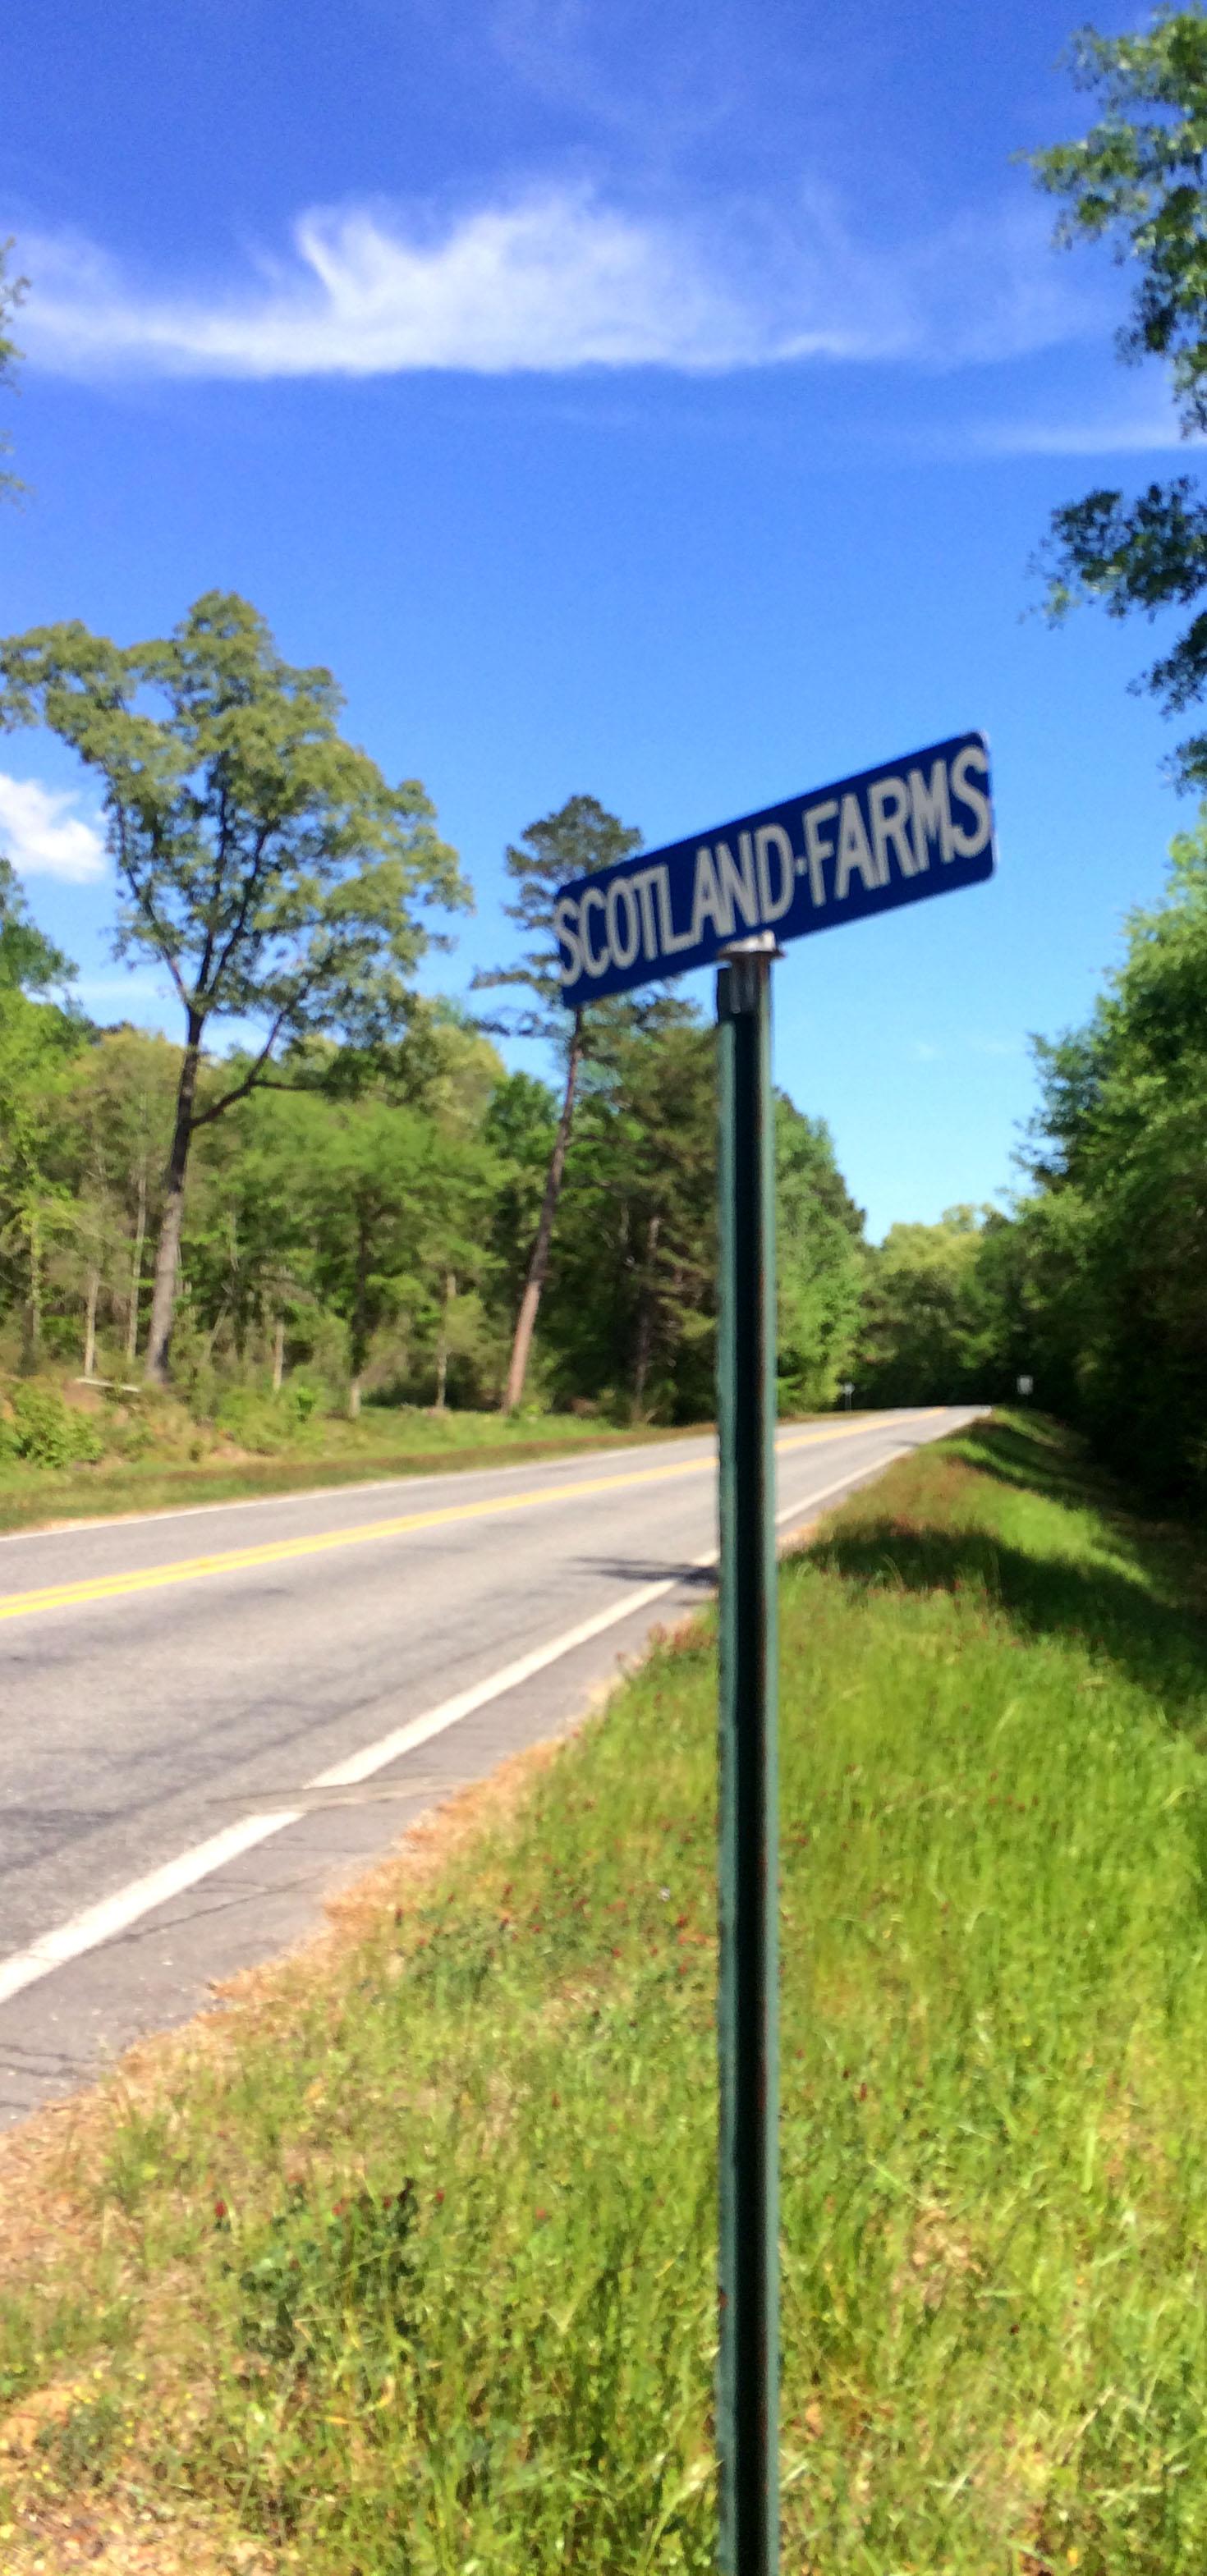 Scotland Farms road sign